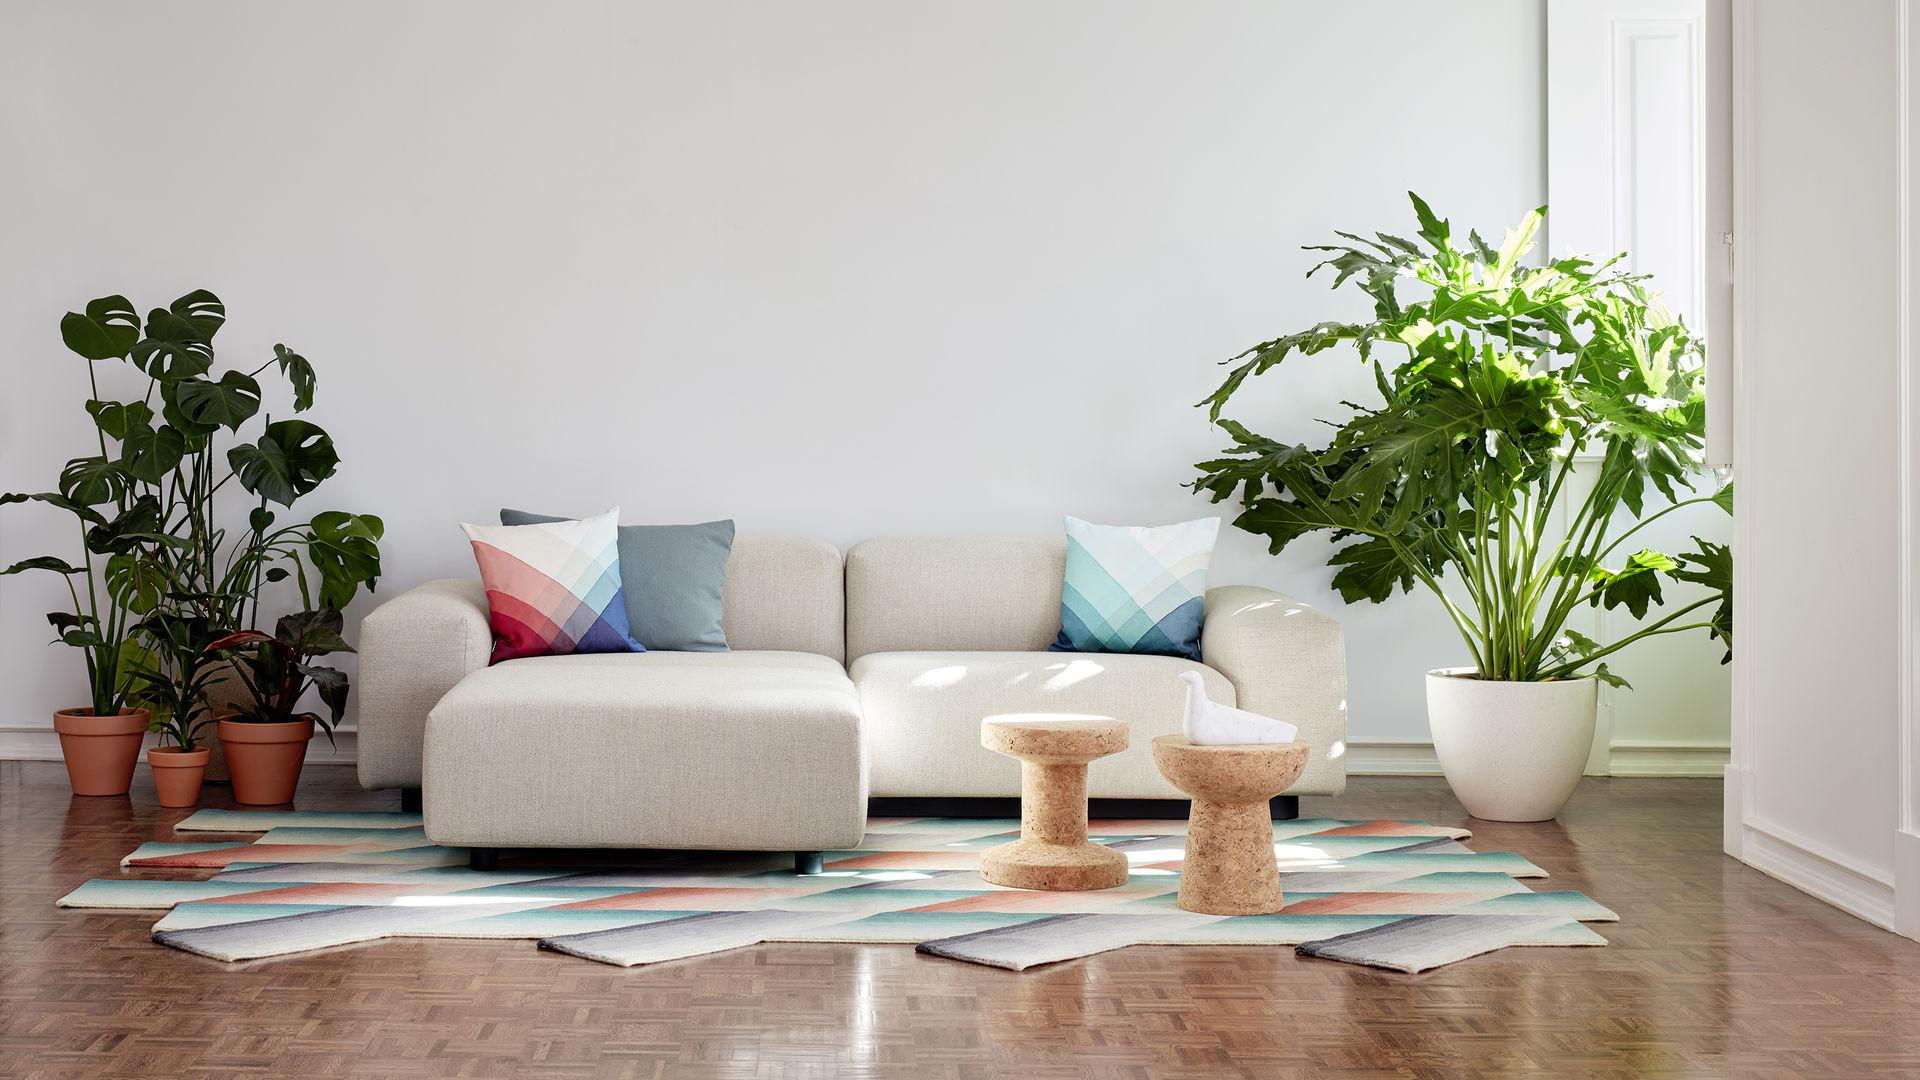 Soft Modular Sofa Soft Modular Ottoman Herringbone Pillows Cork Stools L'oiseau marble_web_16-9